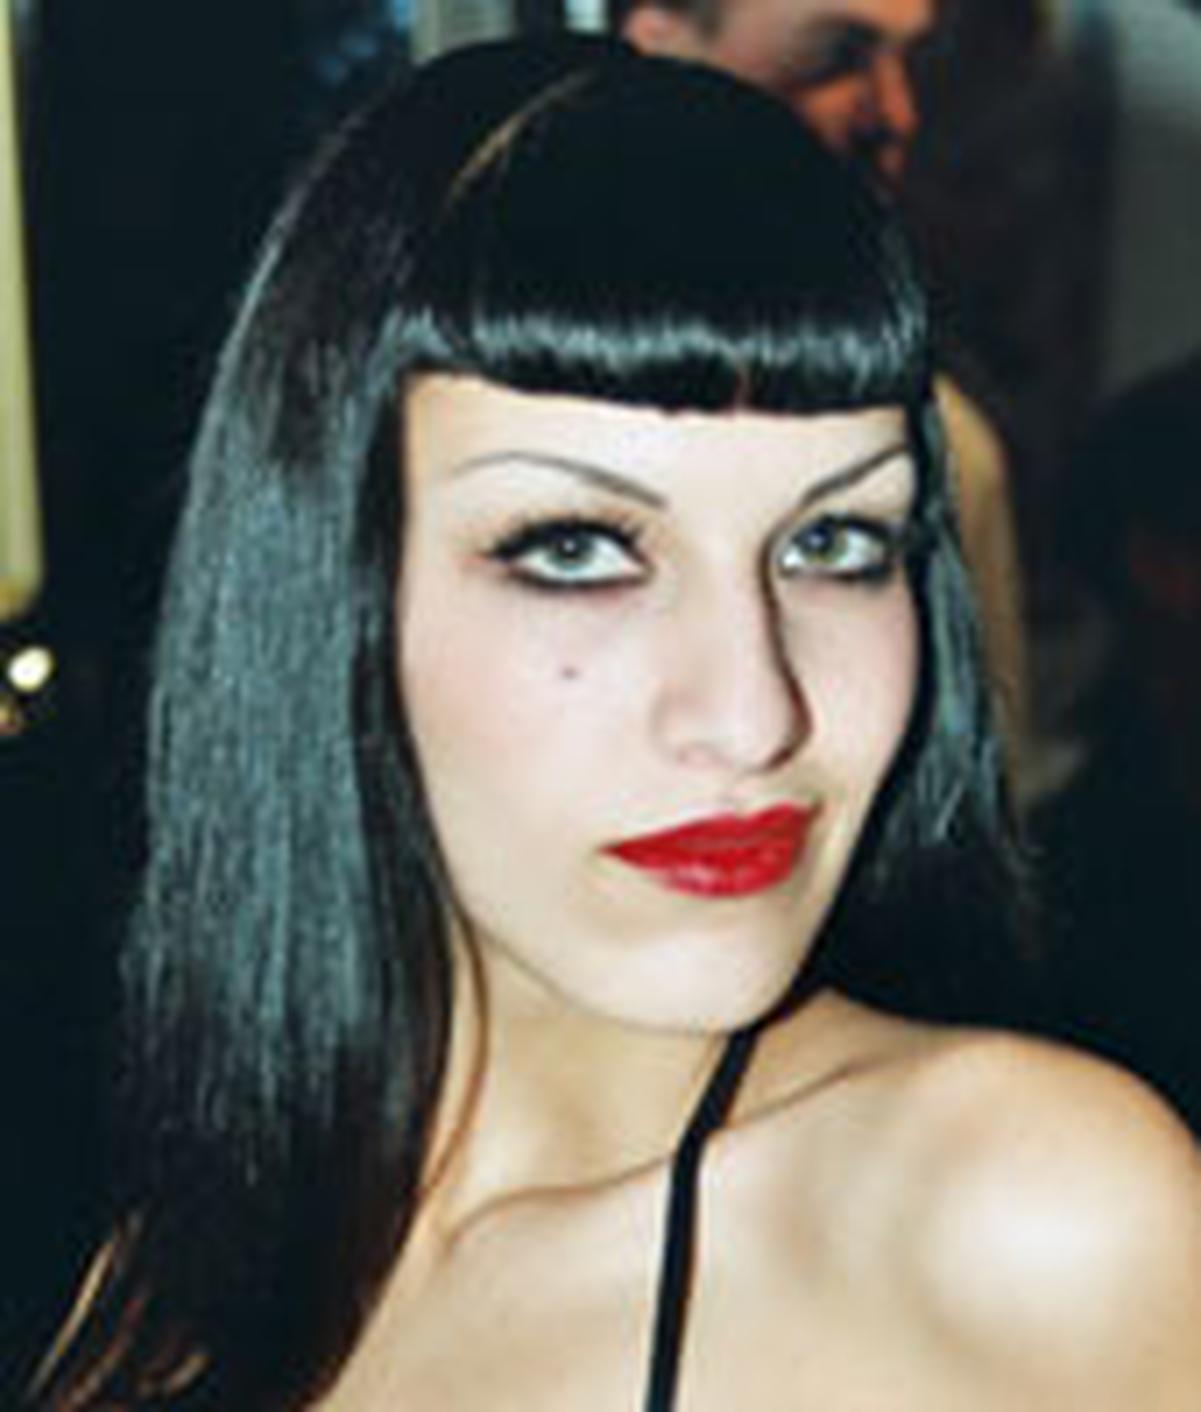 Rachel Rotten Wiki & Bio - Pornographic Actress